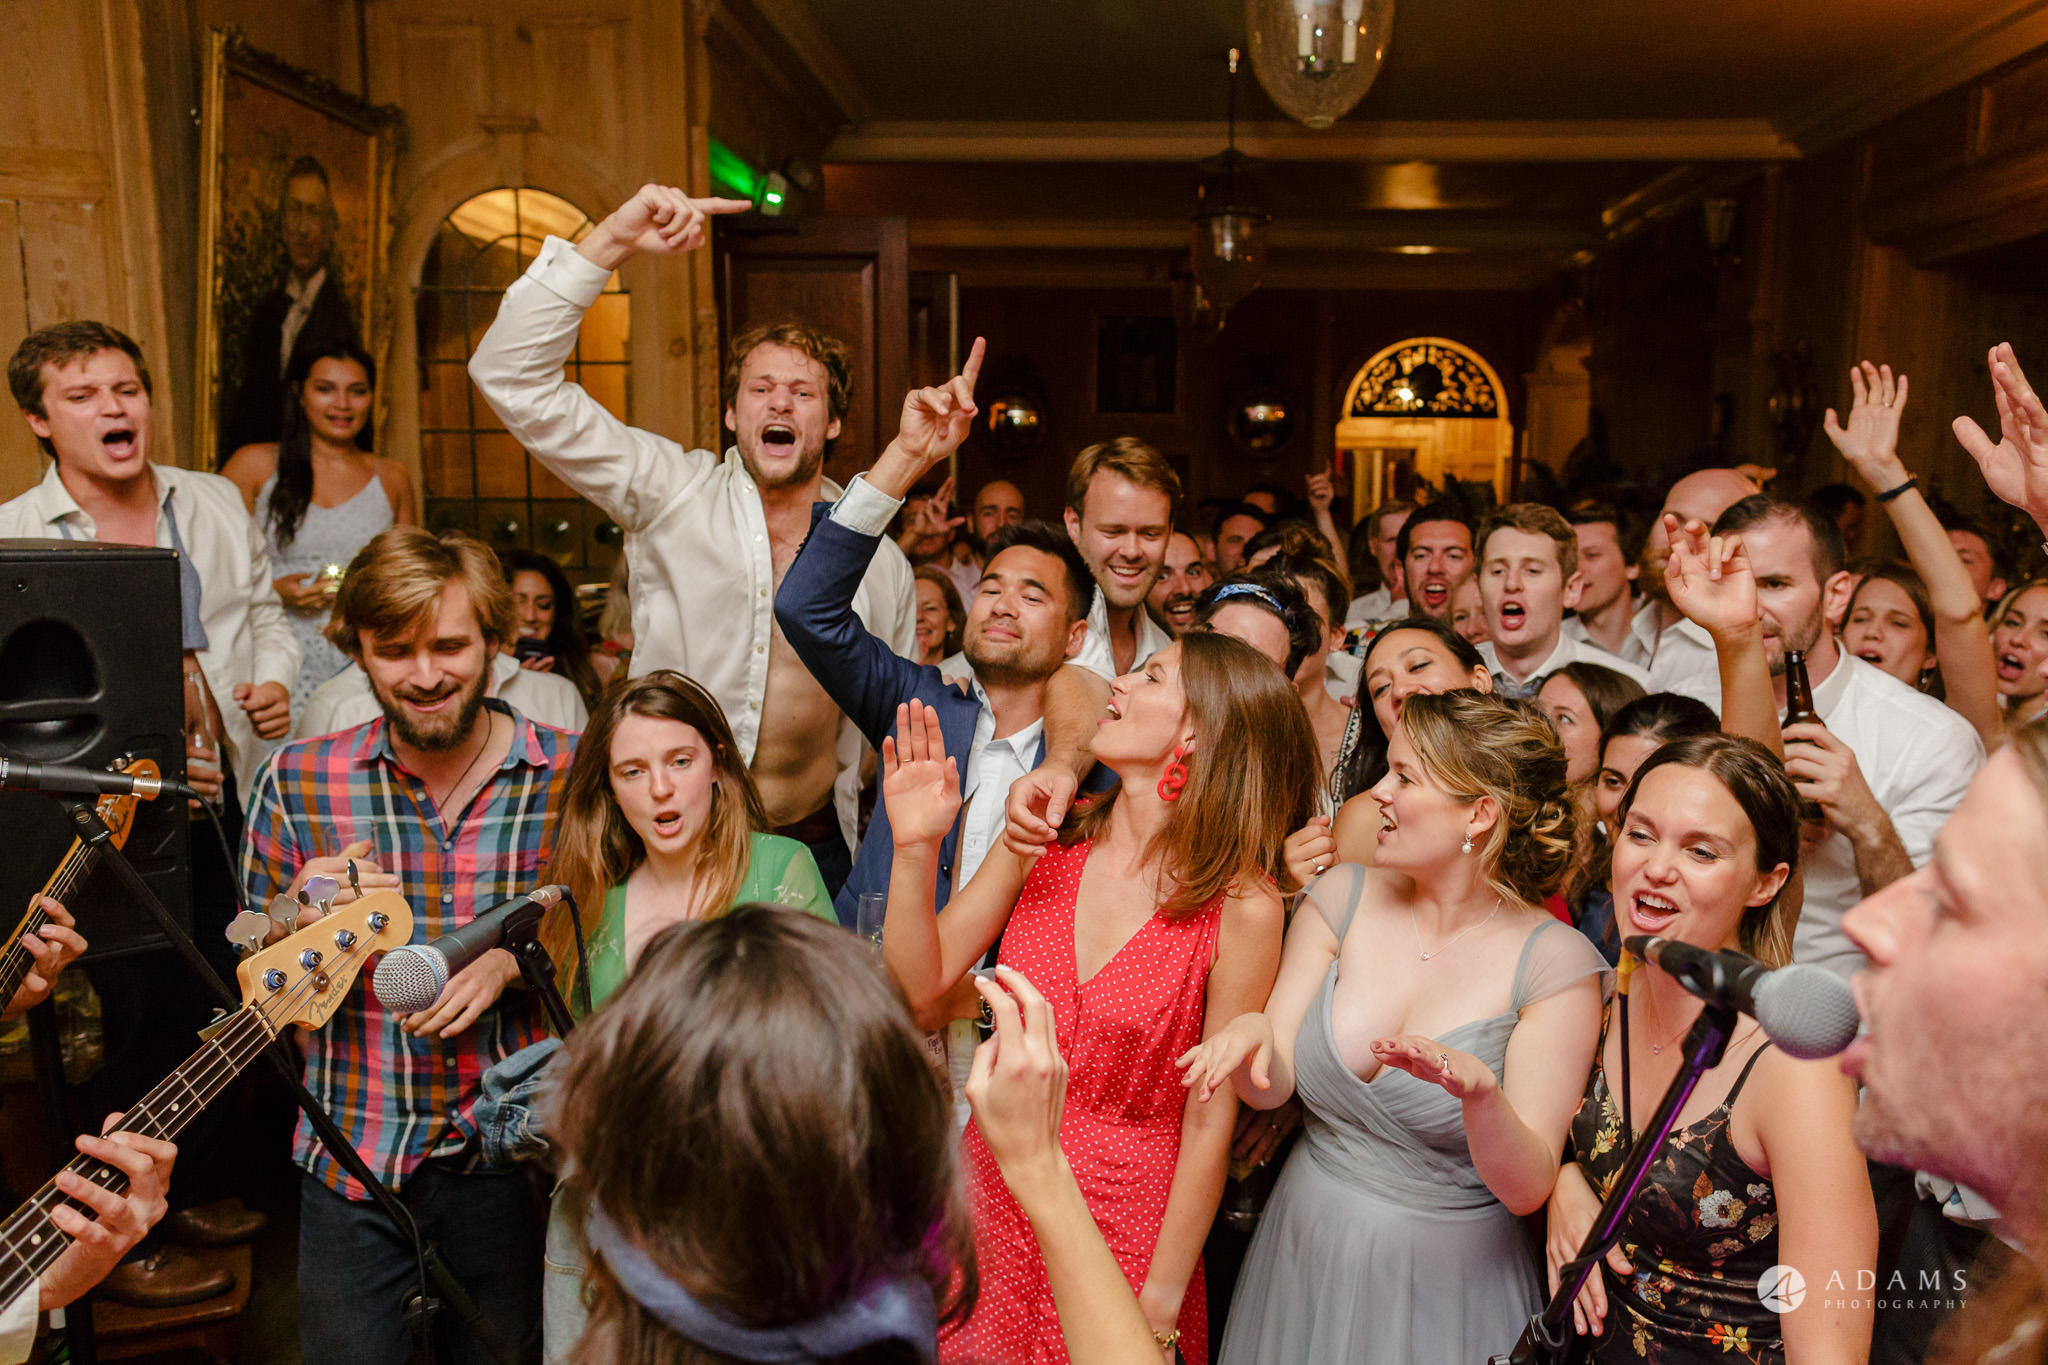 Trinity College Cambridge wedding crowd dances